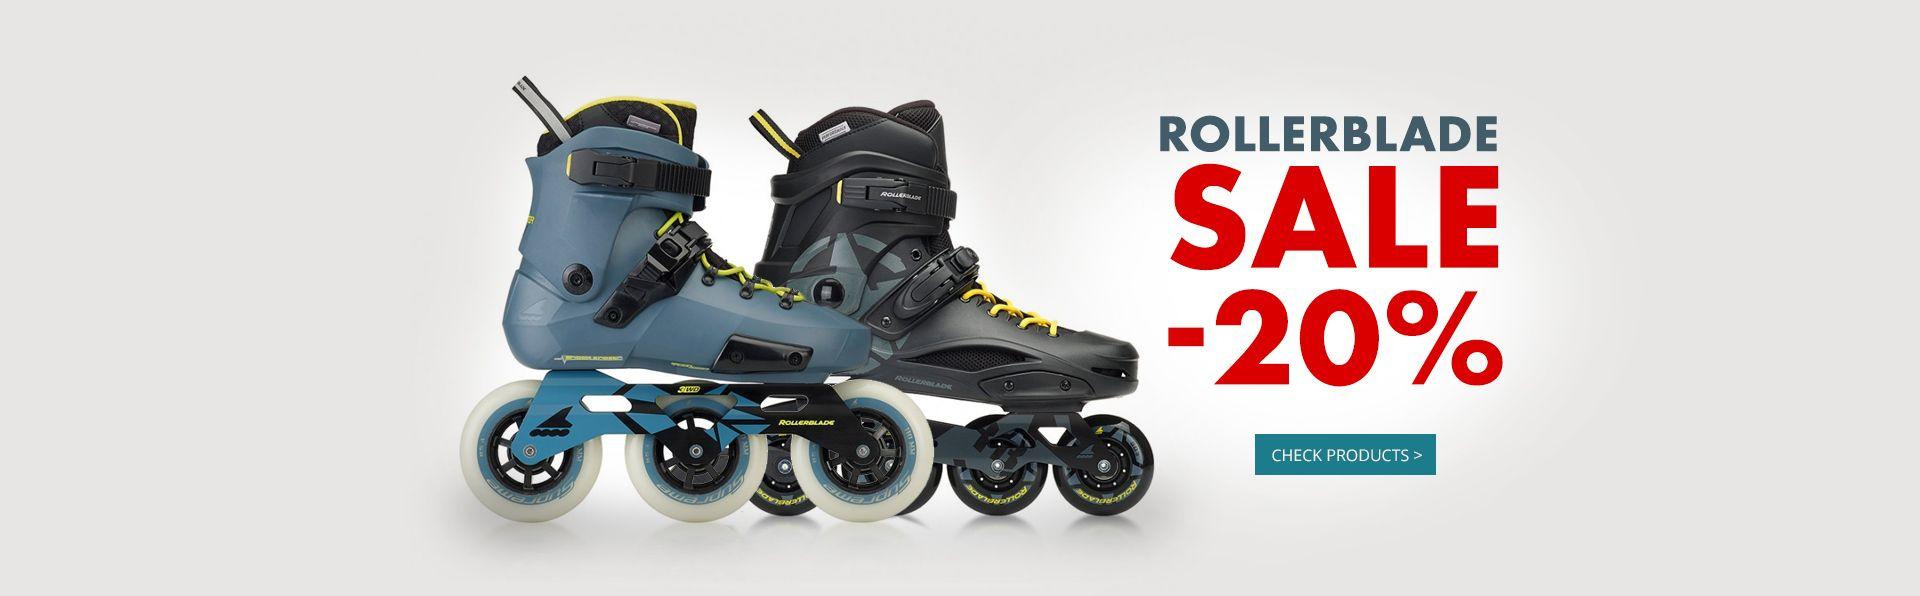 Rollerblade Sale